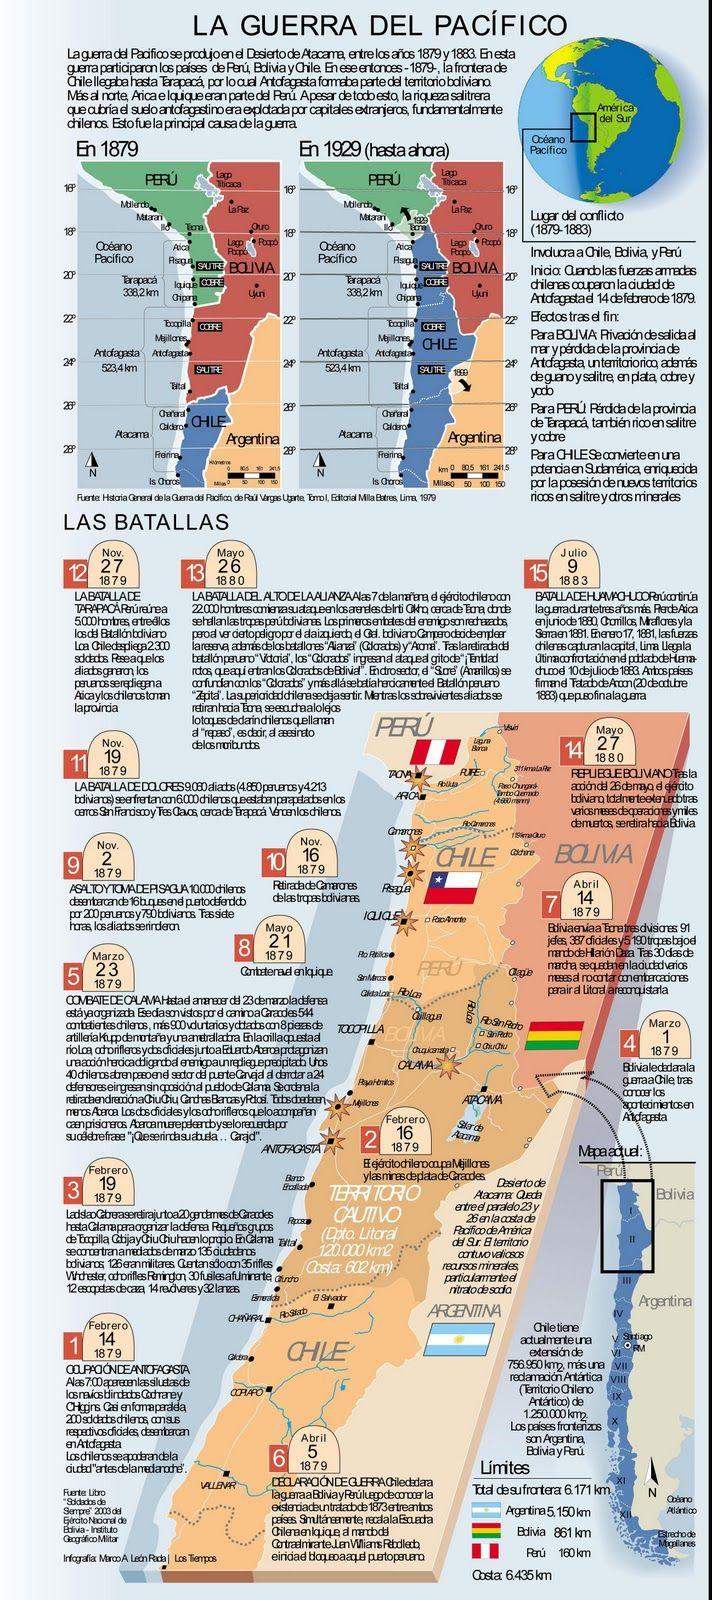 infografia guerra del pacifico - Buscar con Google